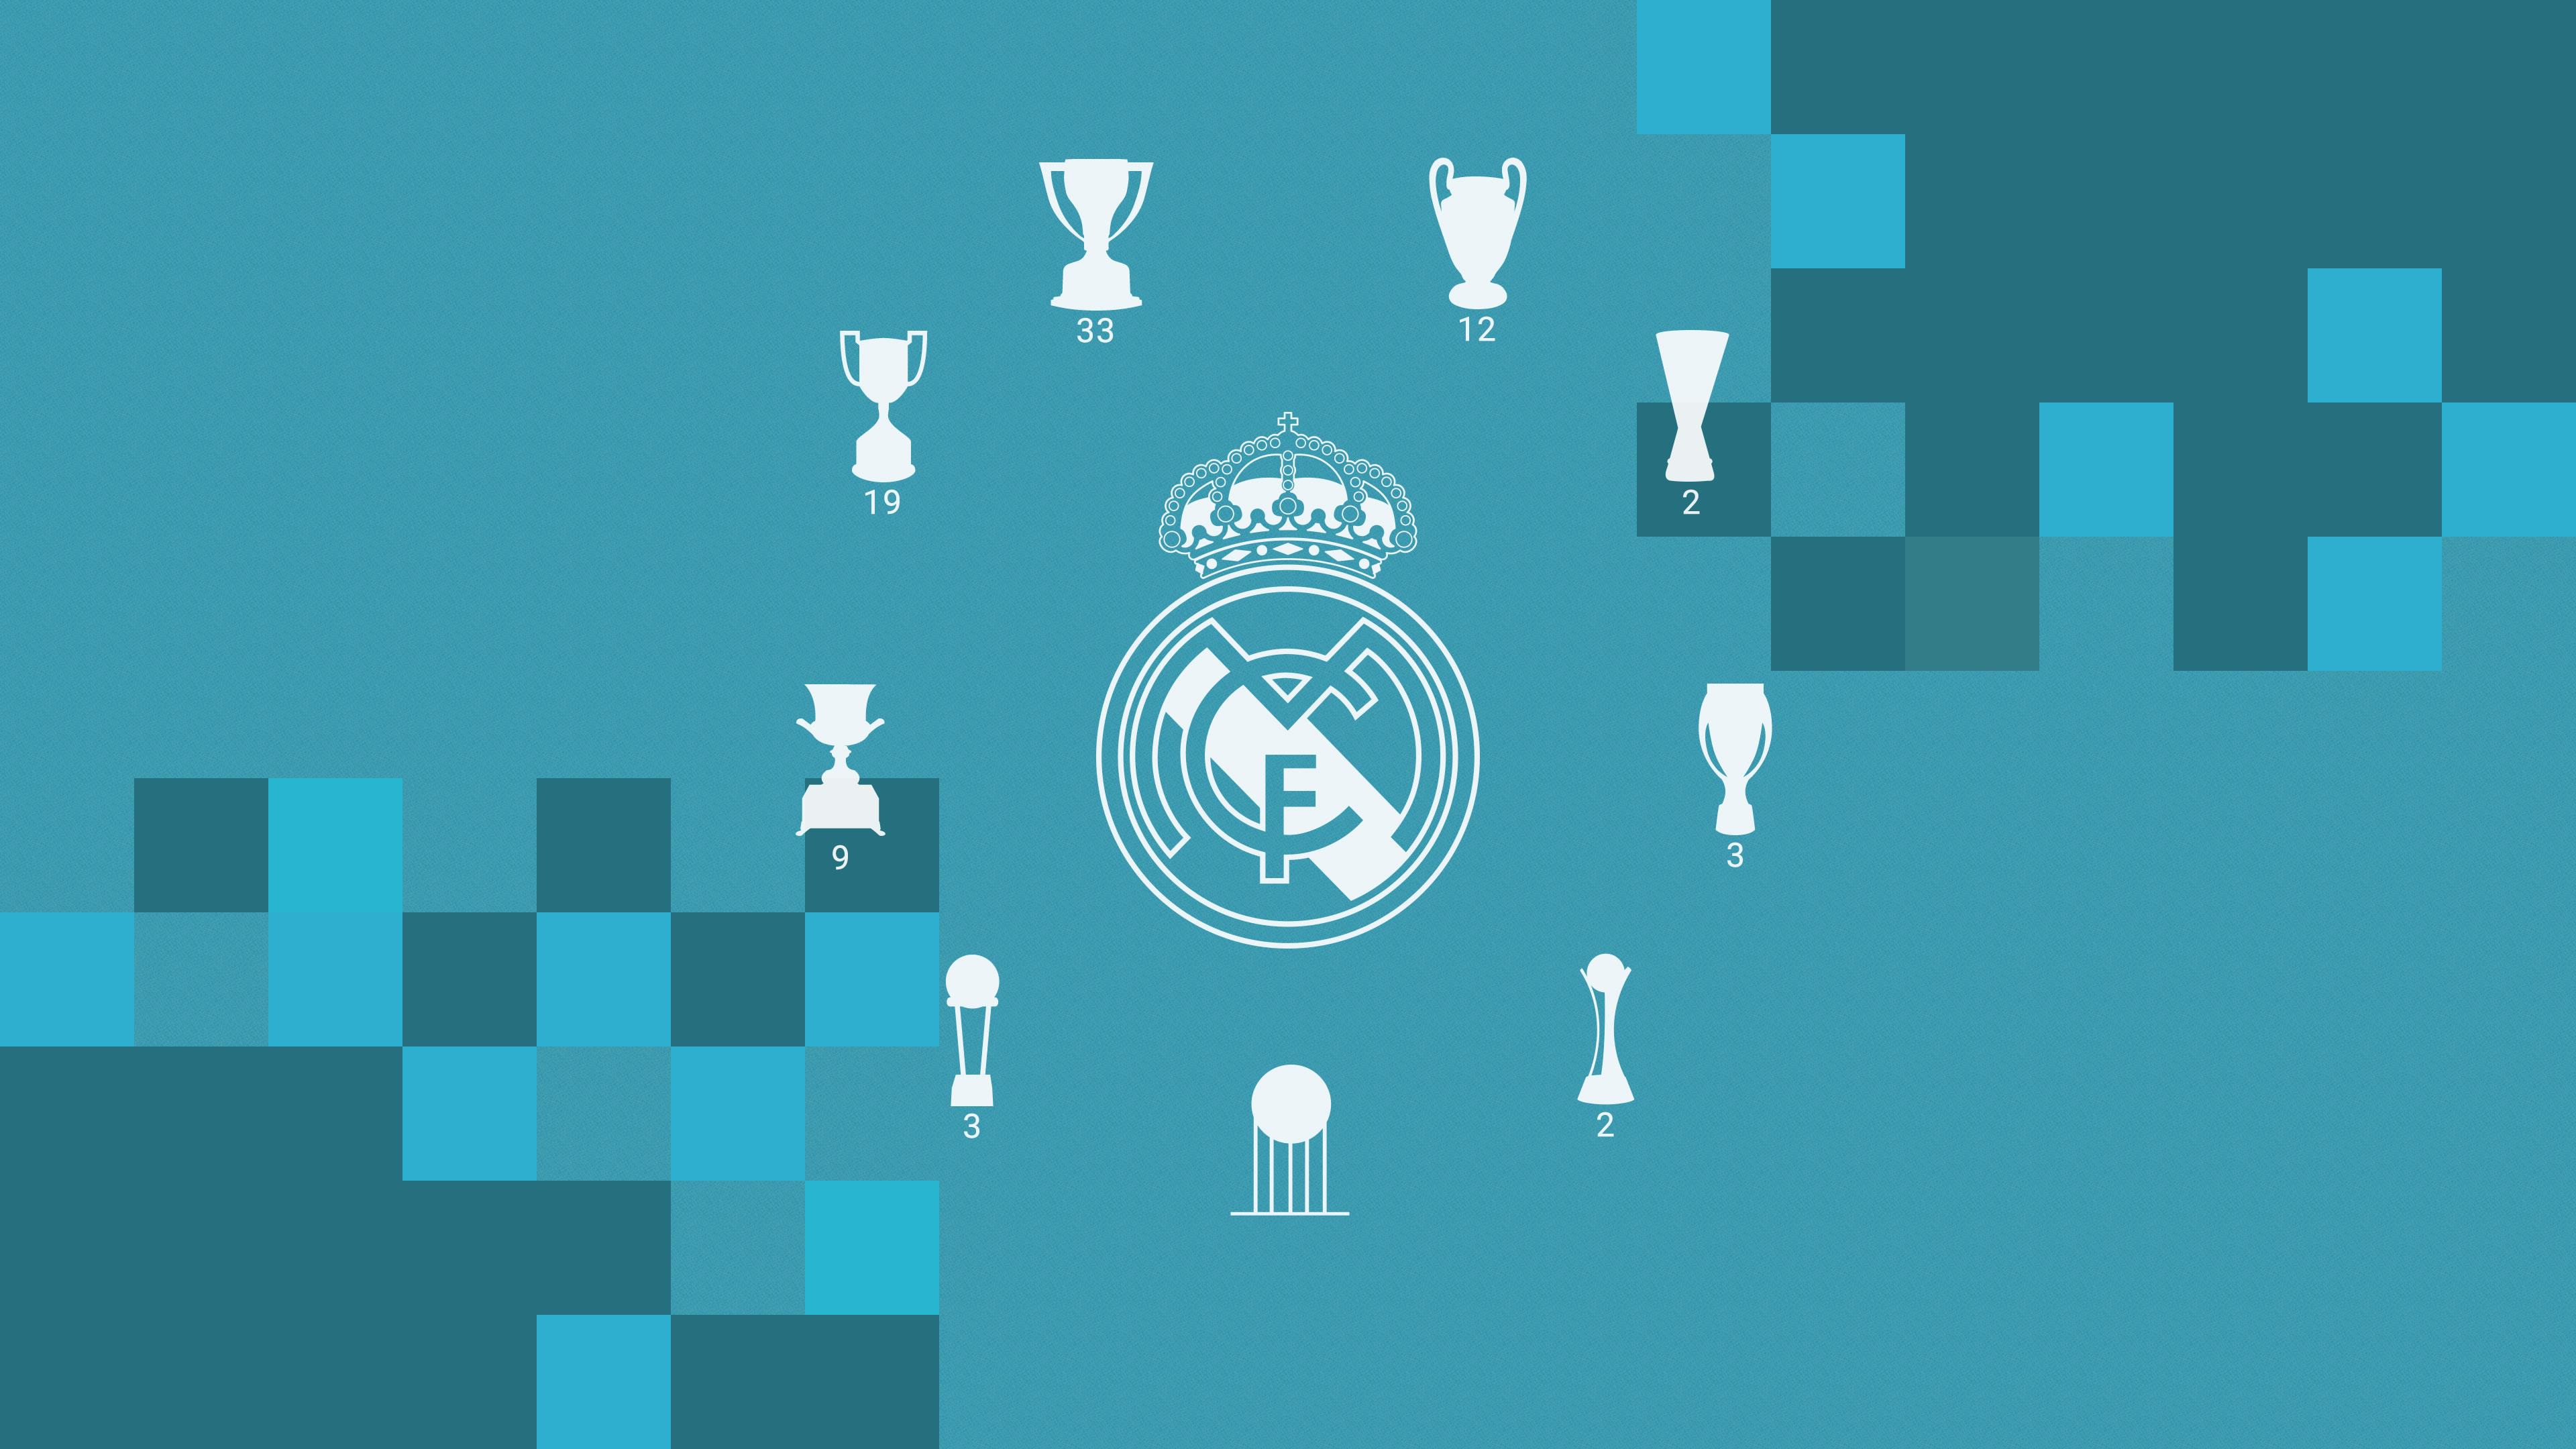 Real Madrid Third Wallpaper 2017 18 By Khalidvawda